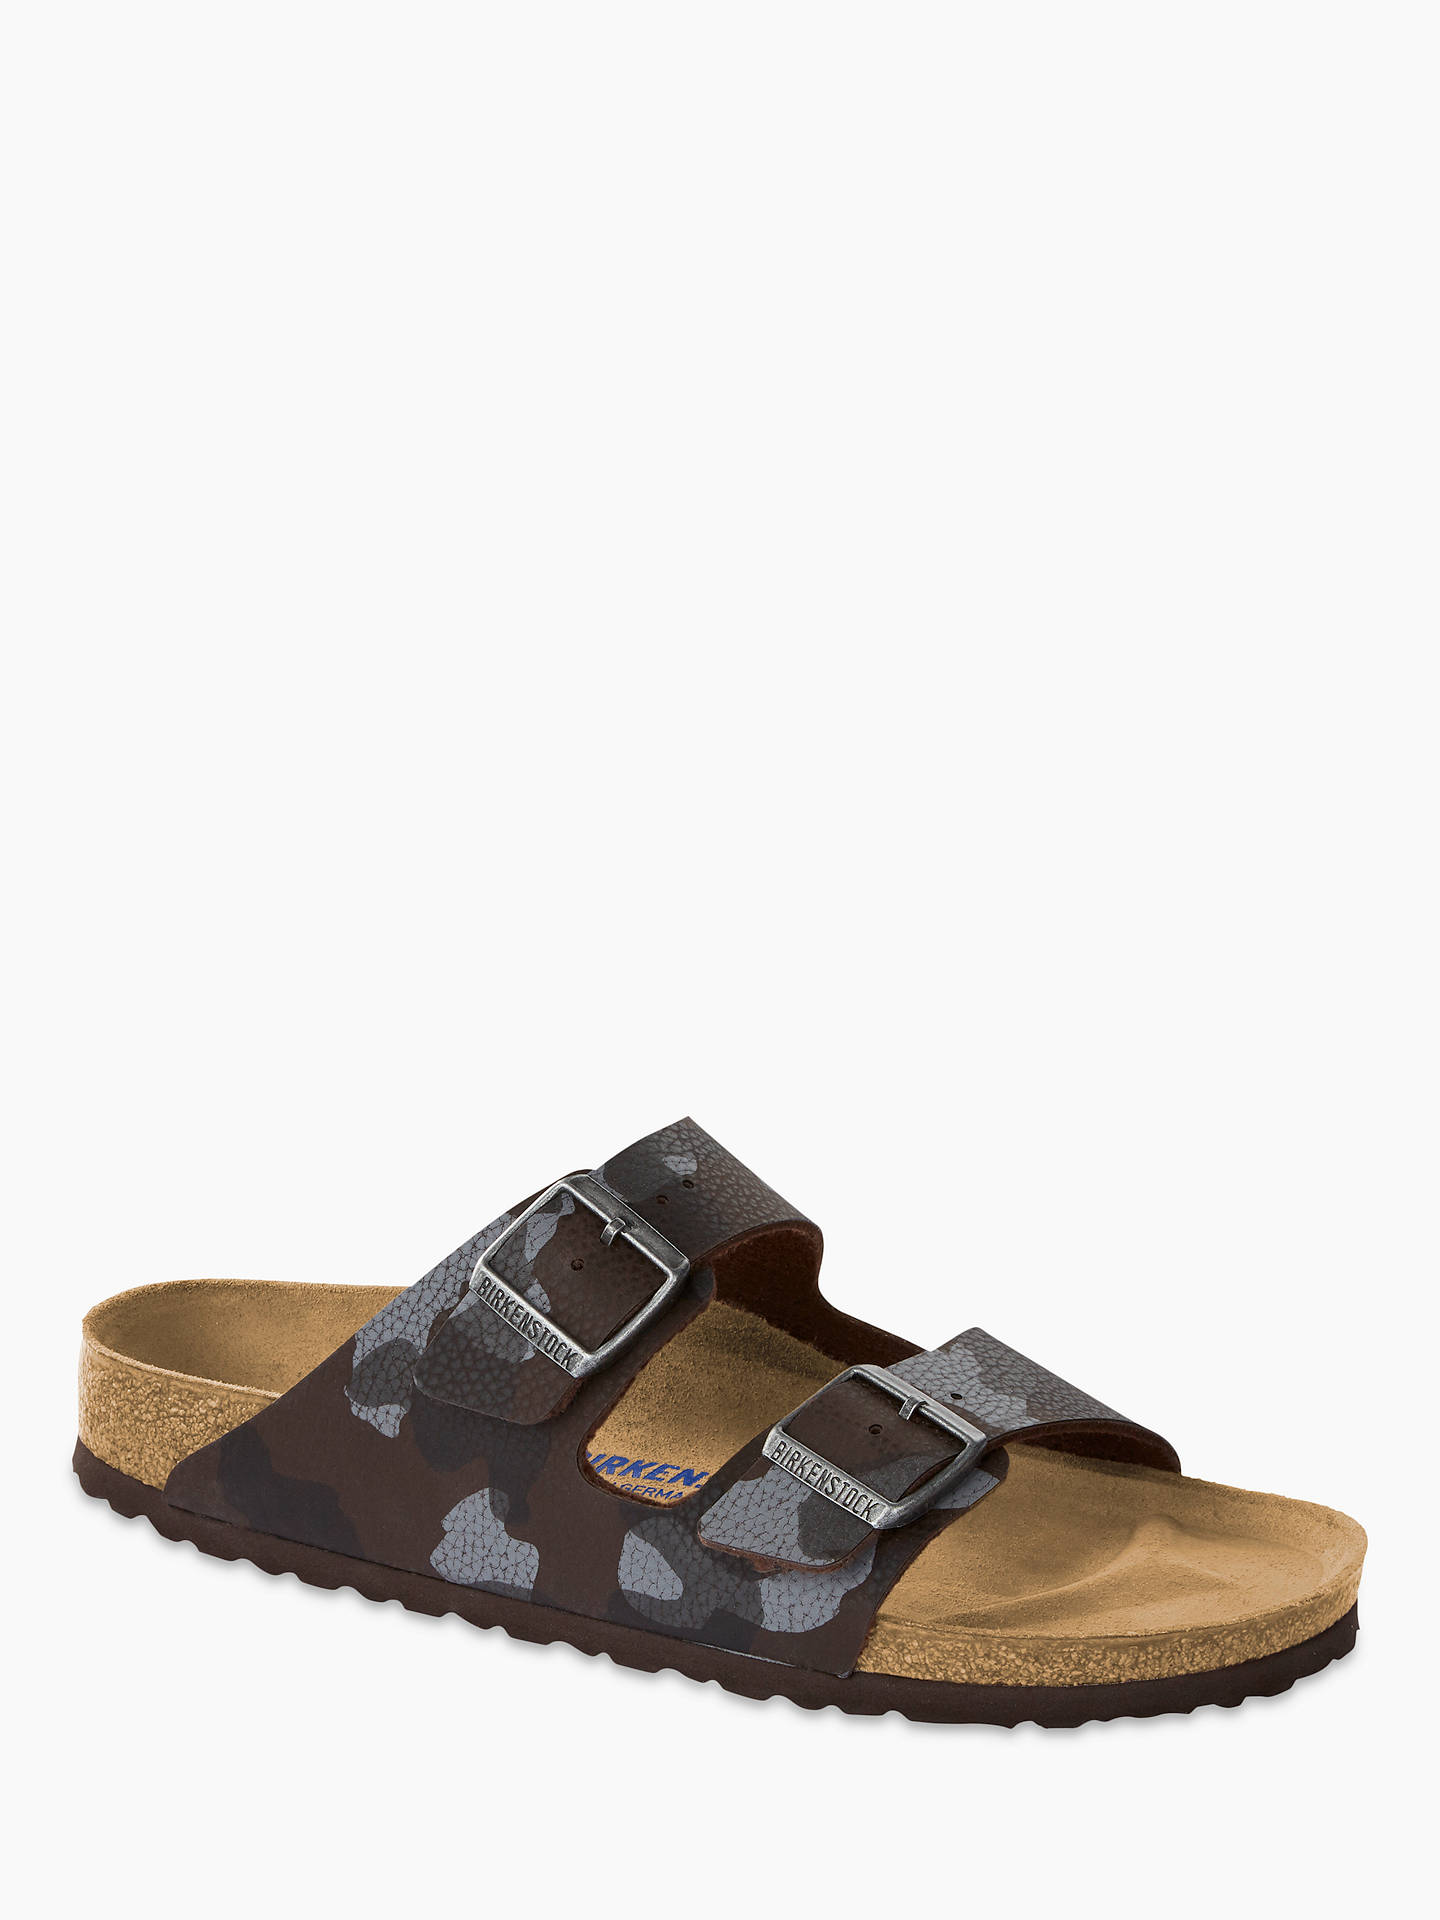 e88a13b494e0 Buy Birkenstock Arizona Camouflage Sandals, Desert Soil Camo, 8 Online at  johnlewis.com